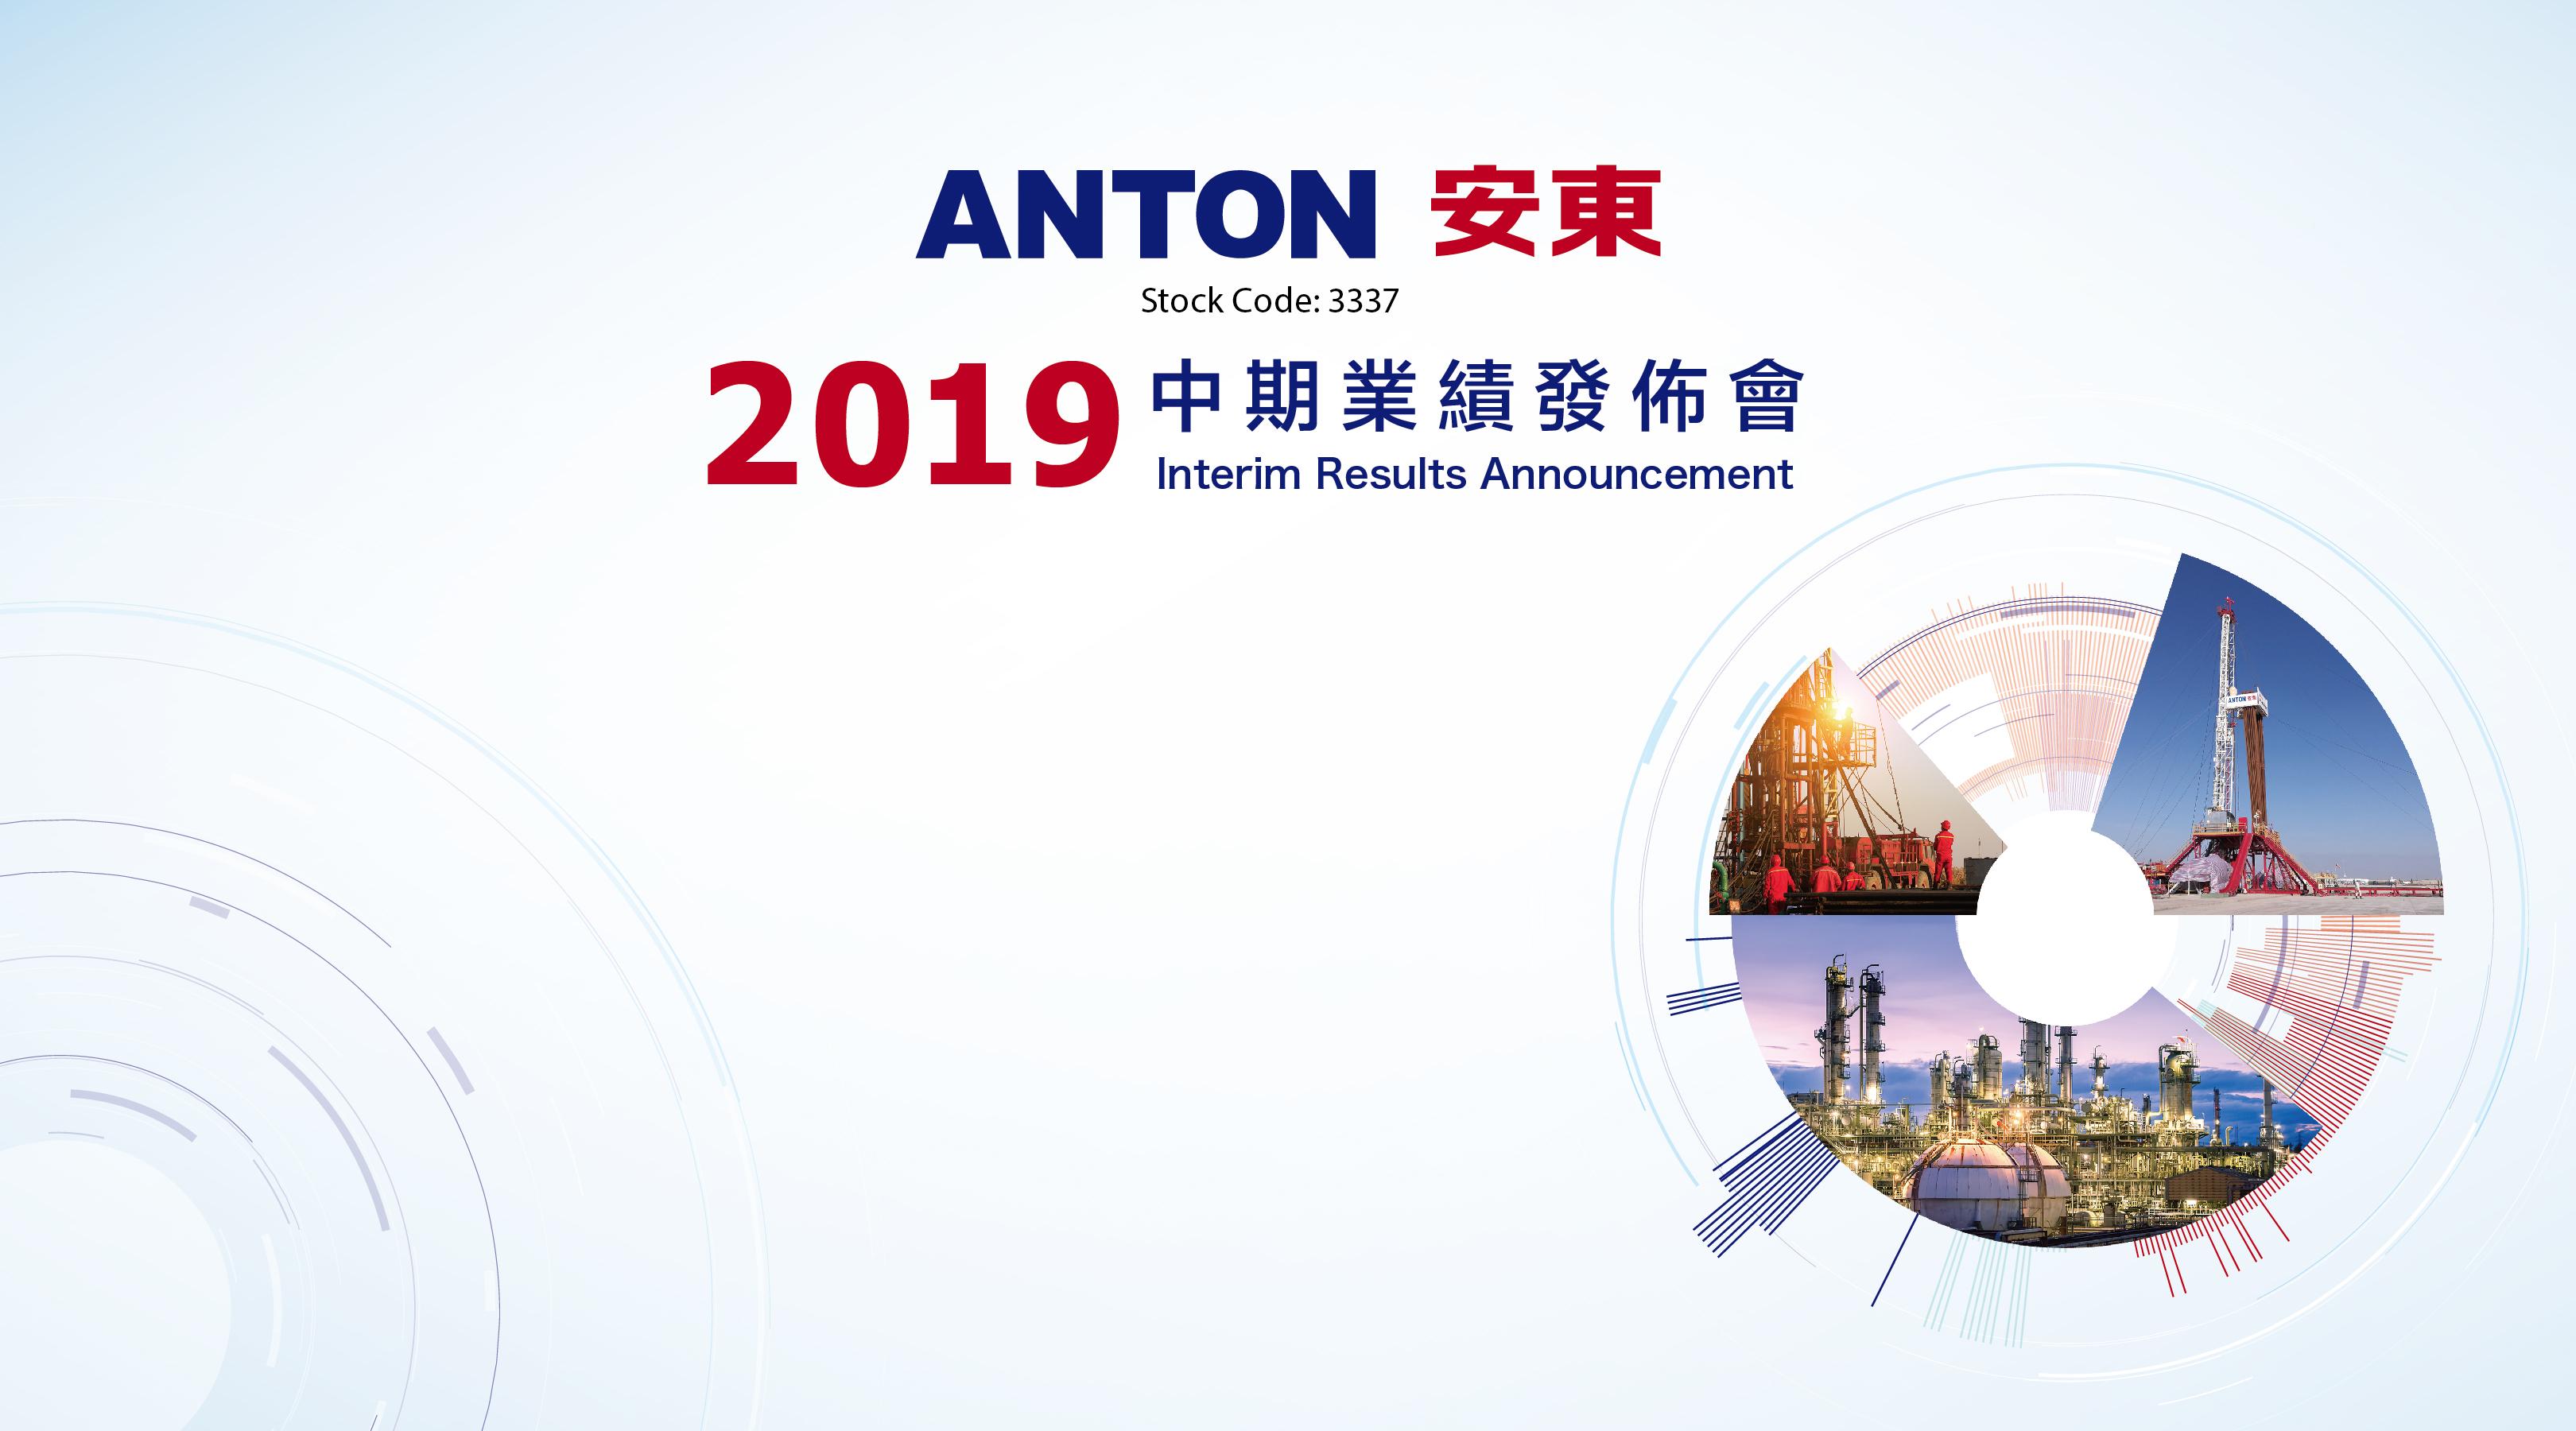 Anton Oilfield Services Group Announces 2019 Interim Results